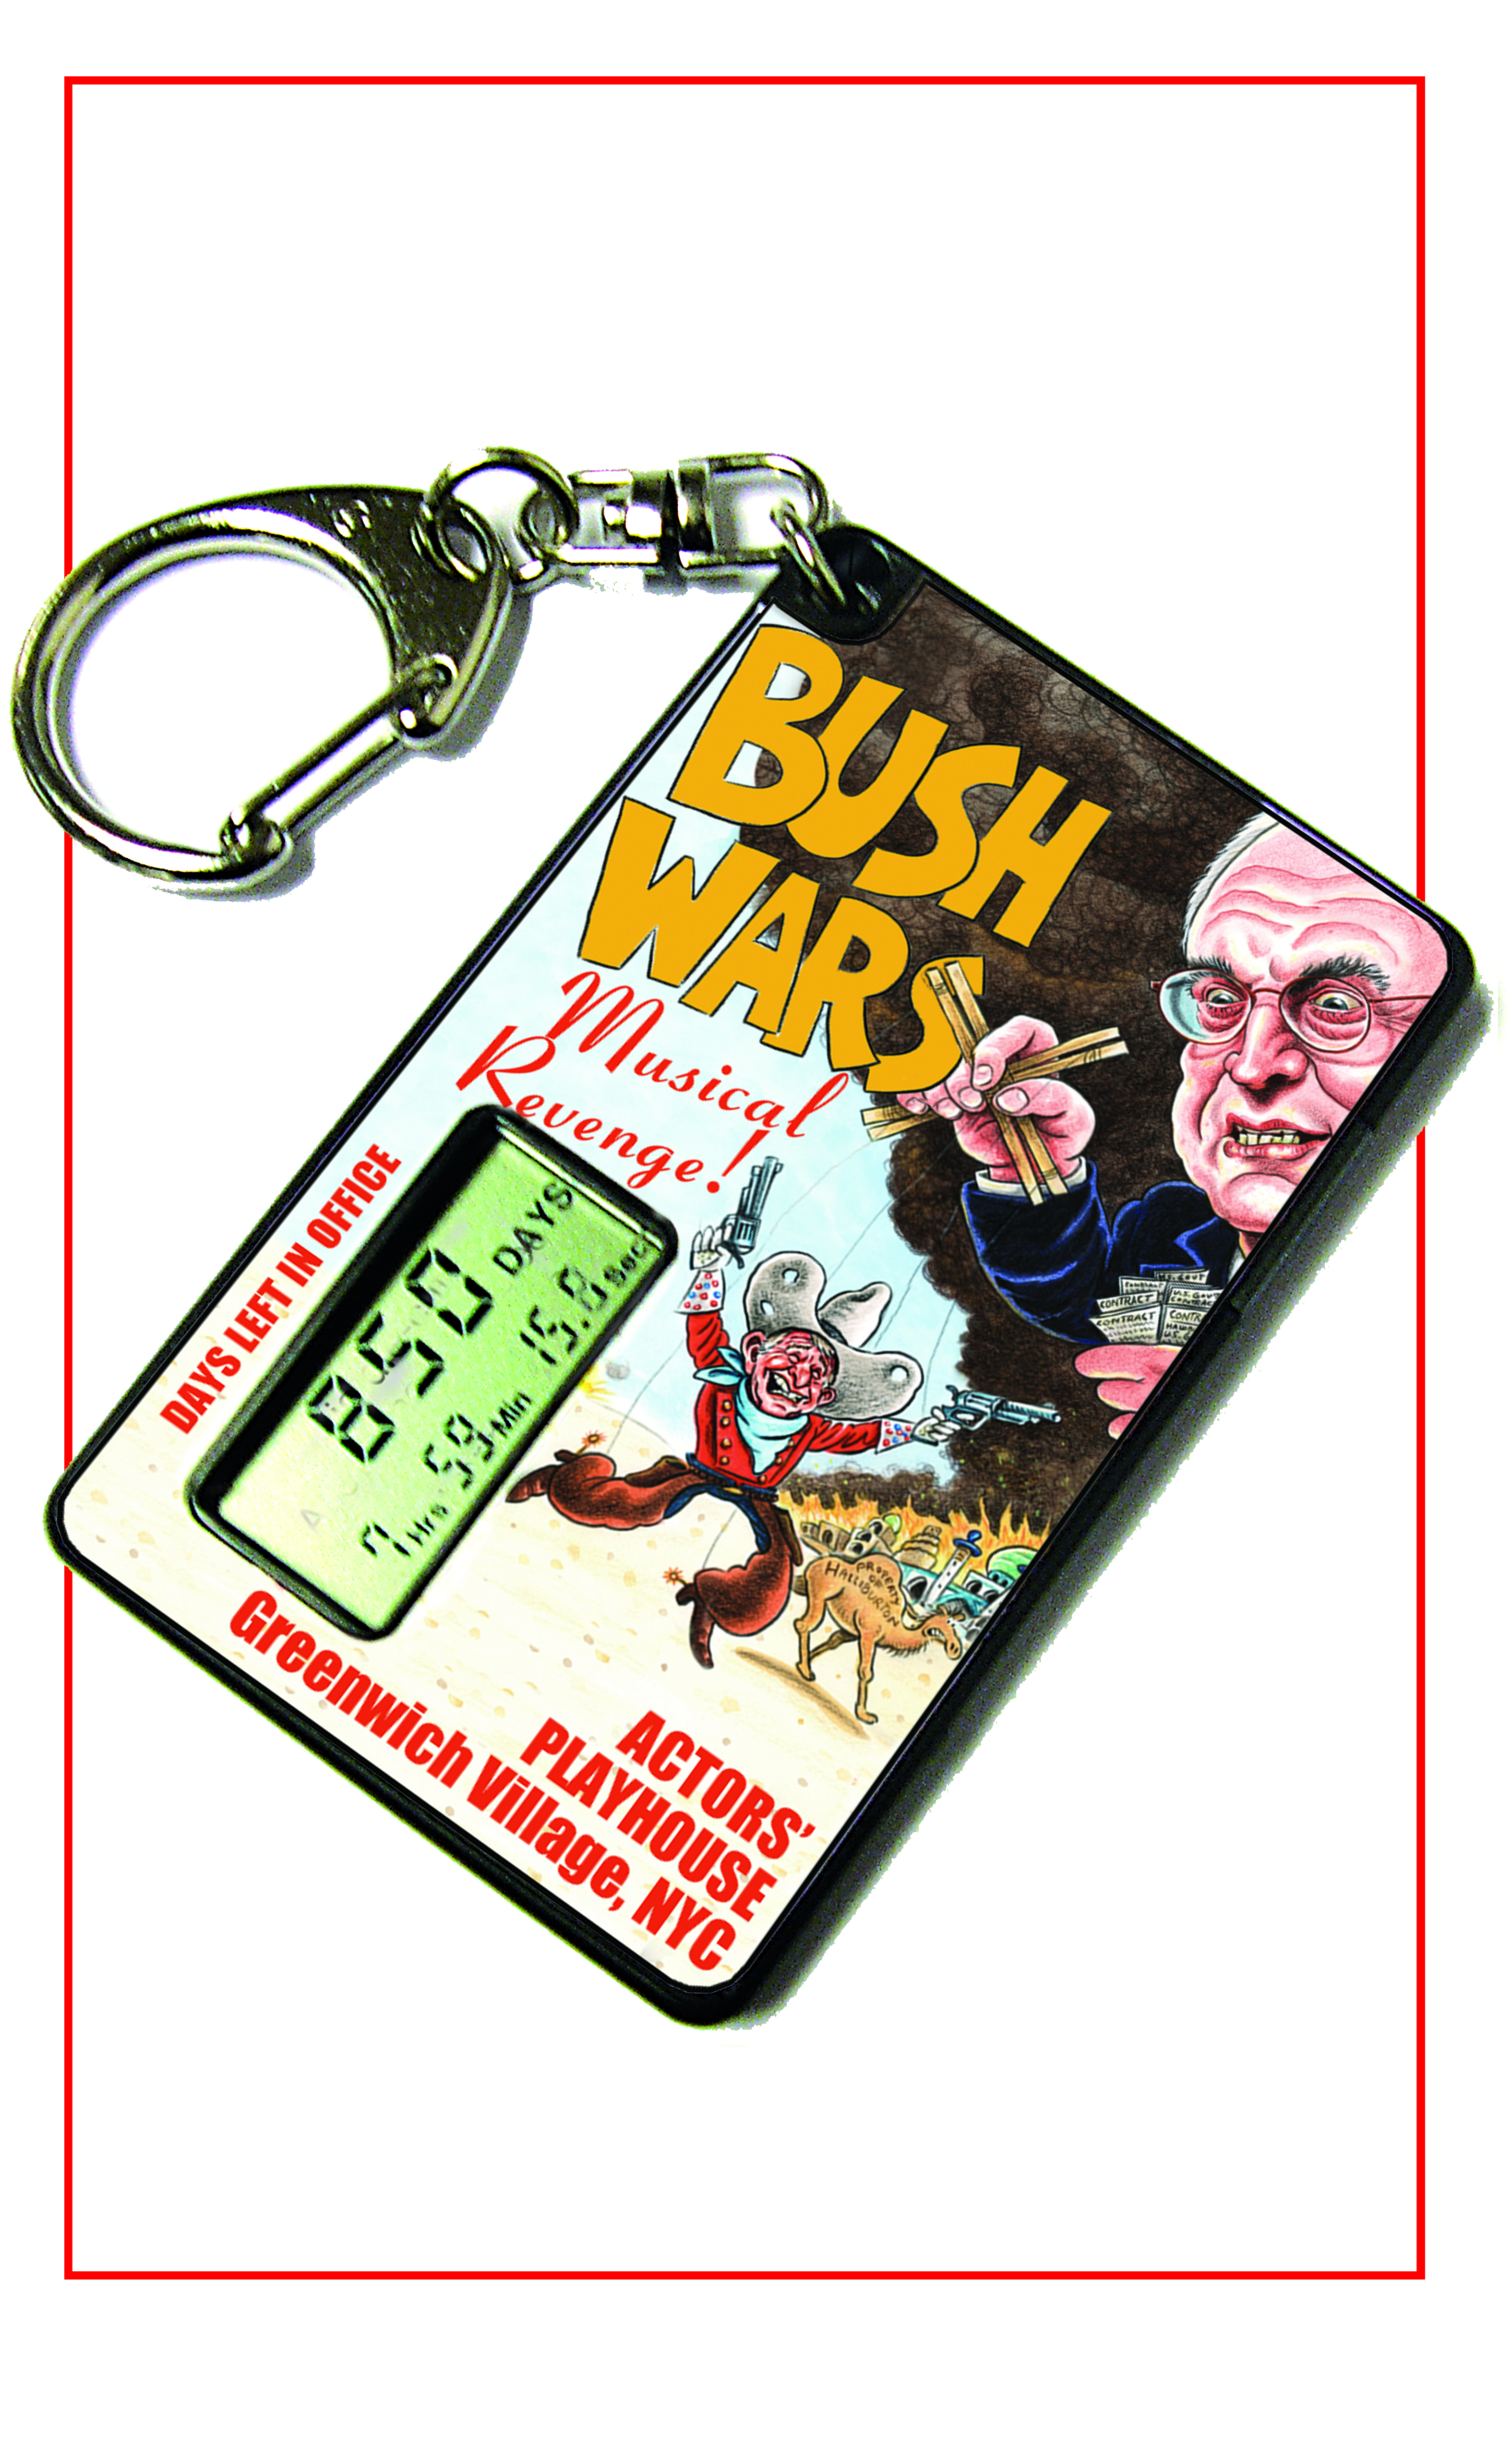 Bush Wars